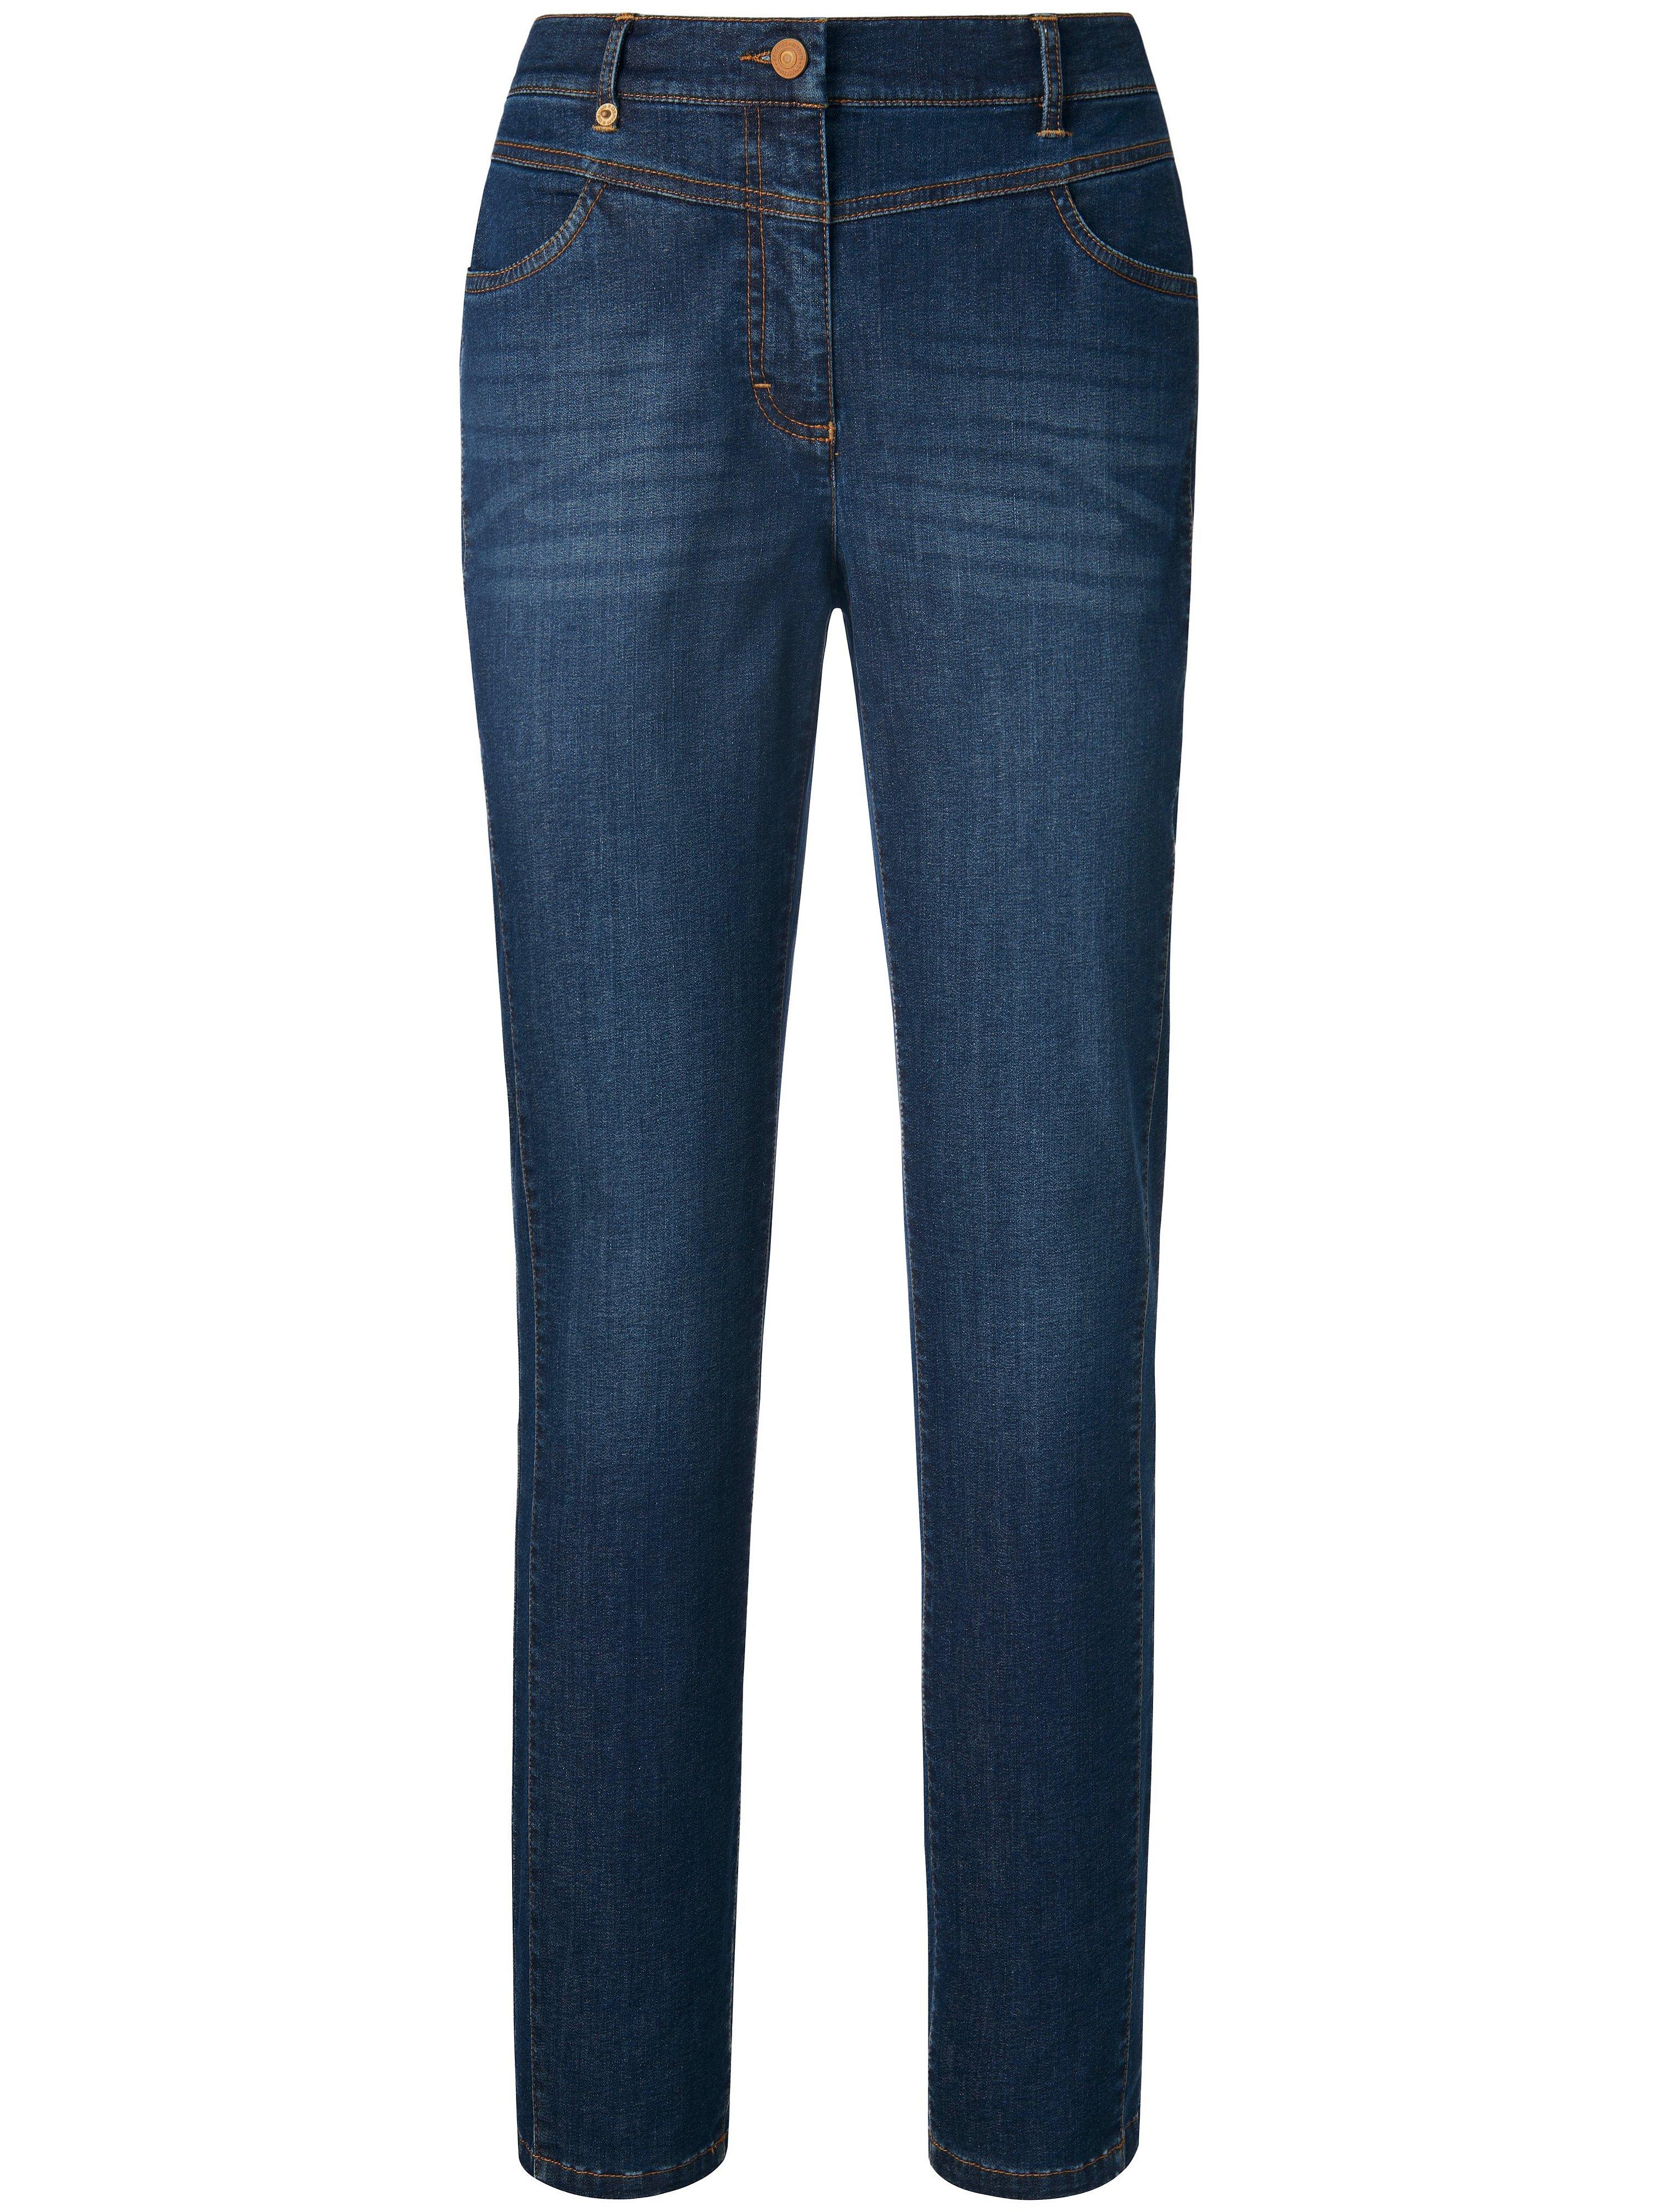 Enkellange thermo-jeans pasvorm Barbara Van Peter Hahn denim